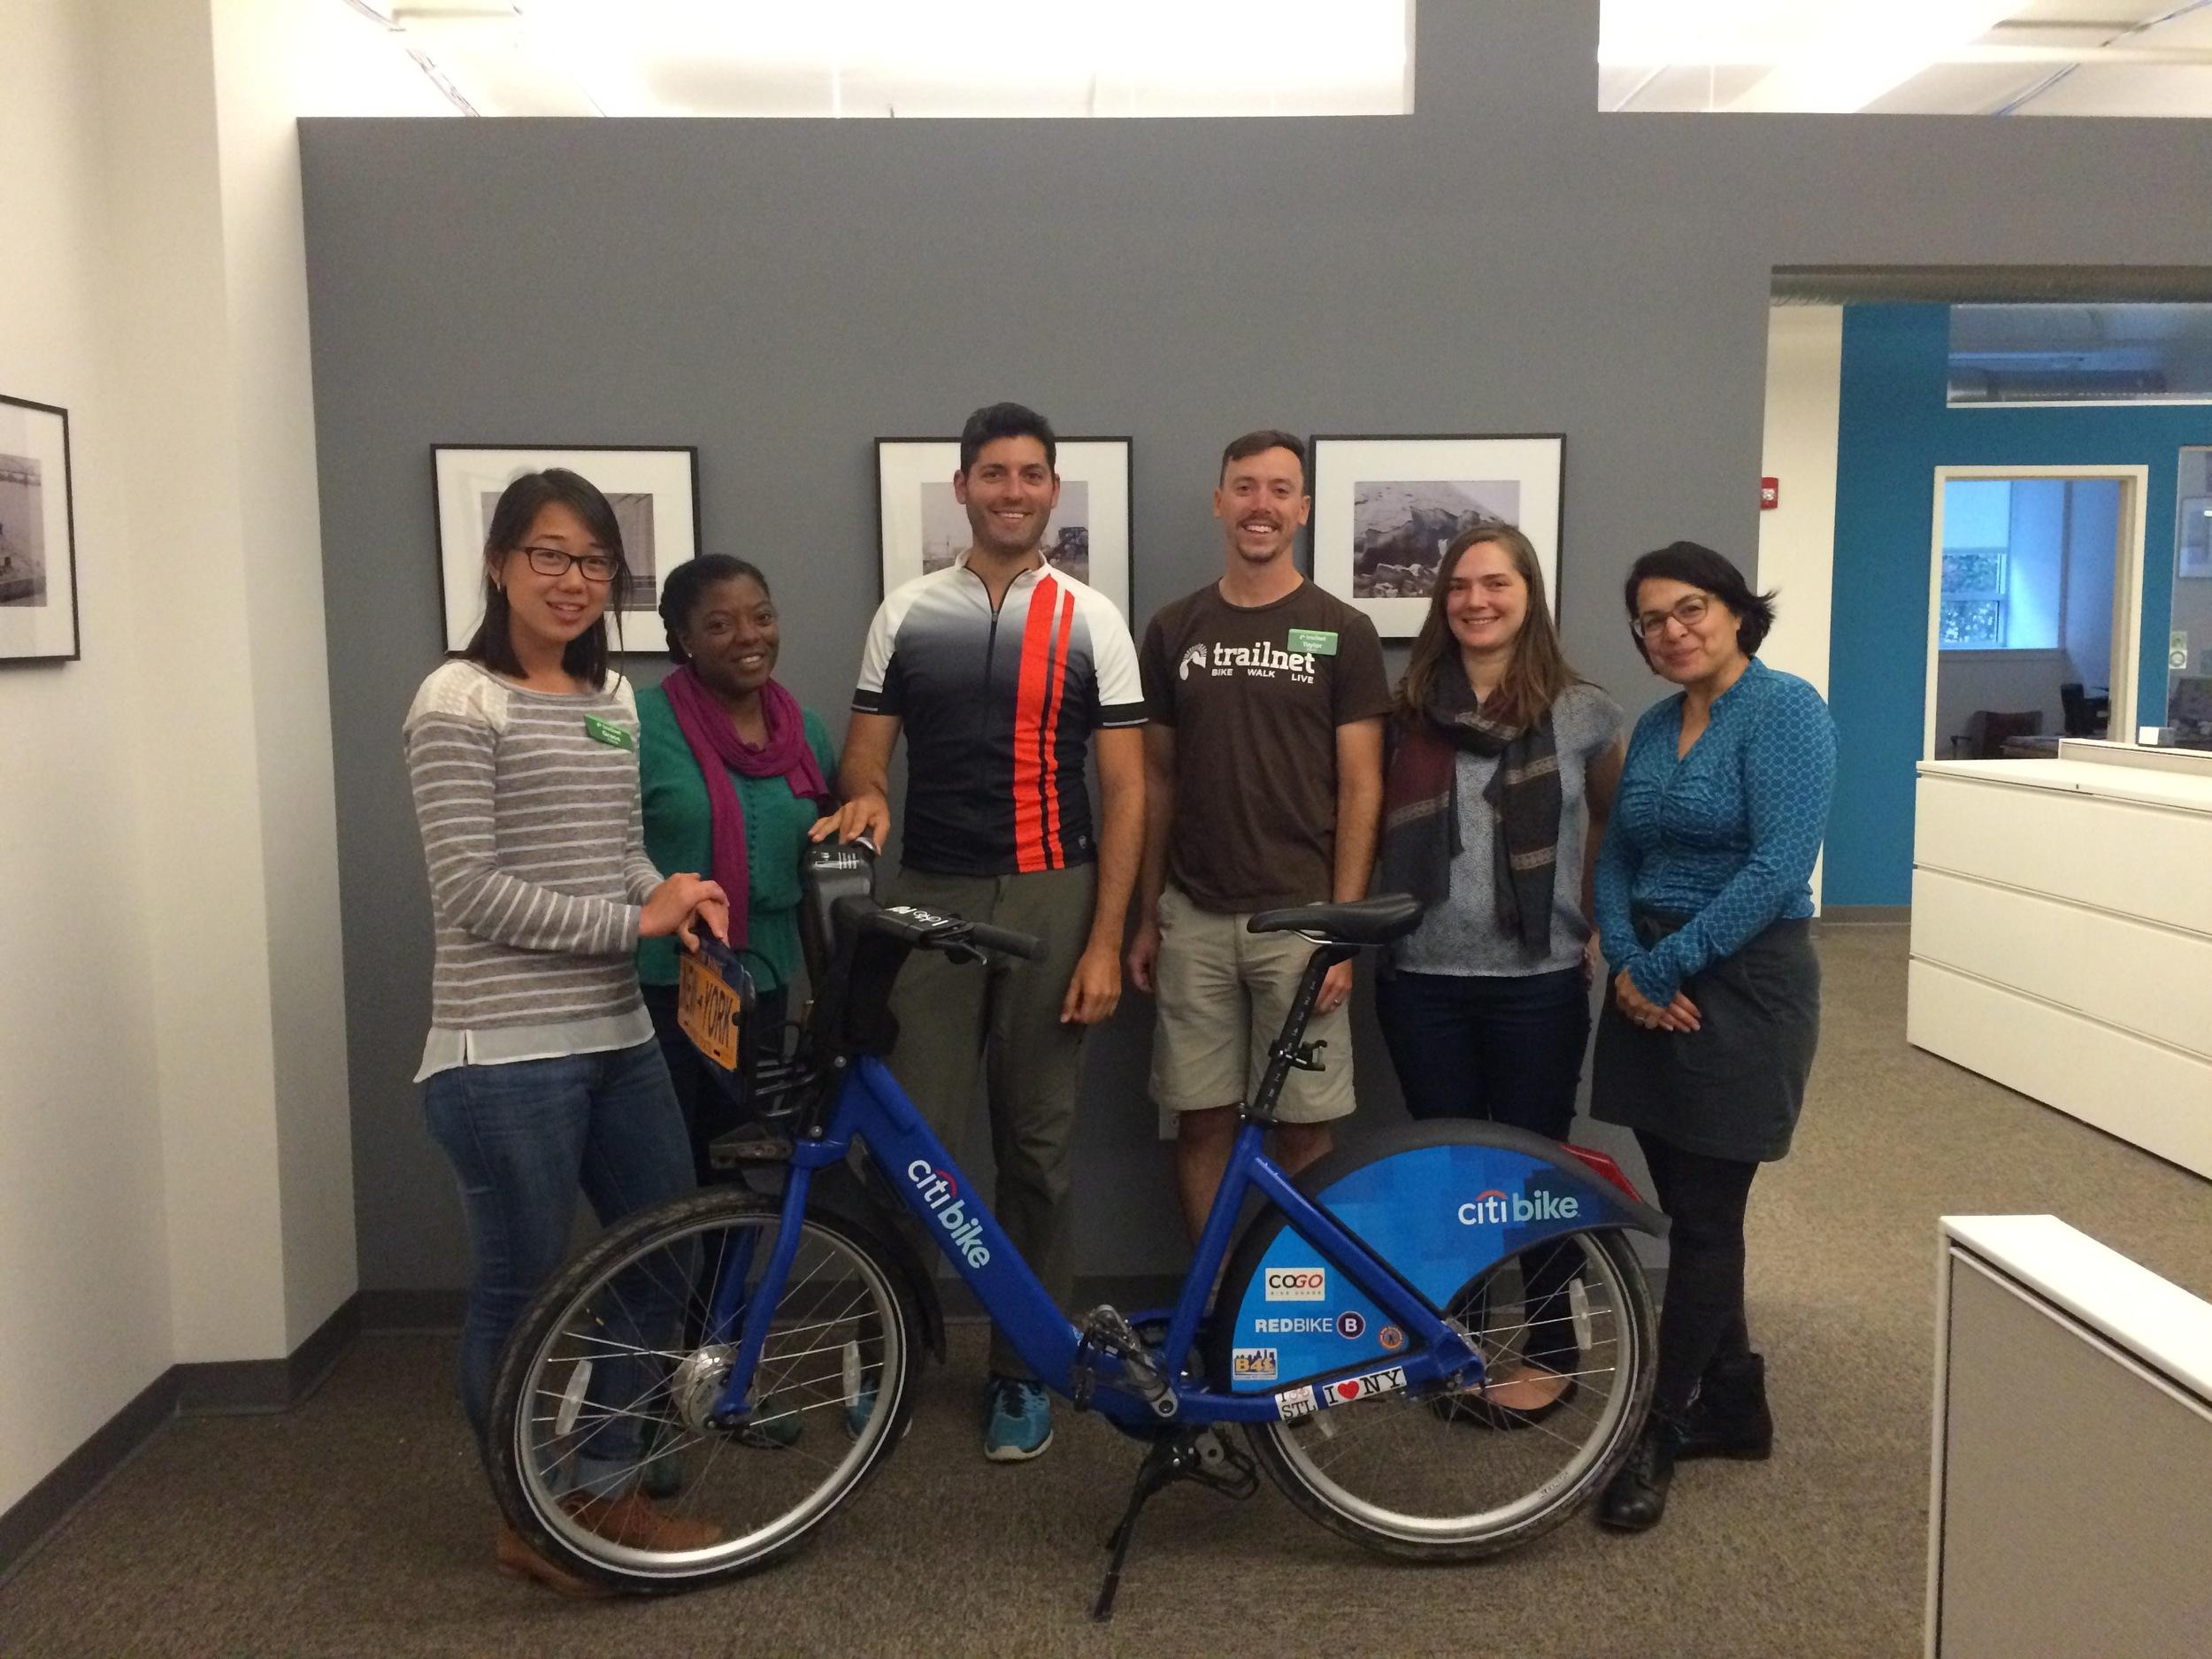 Grace, Jennifer, Countri Bike, Taylor, Marielle and Cindy of Trailnet